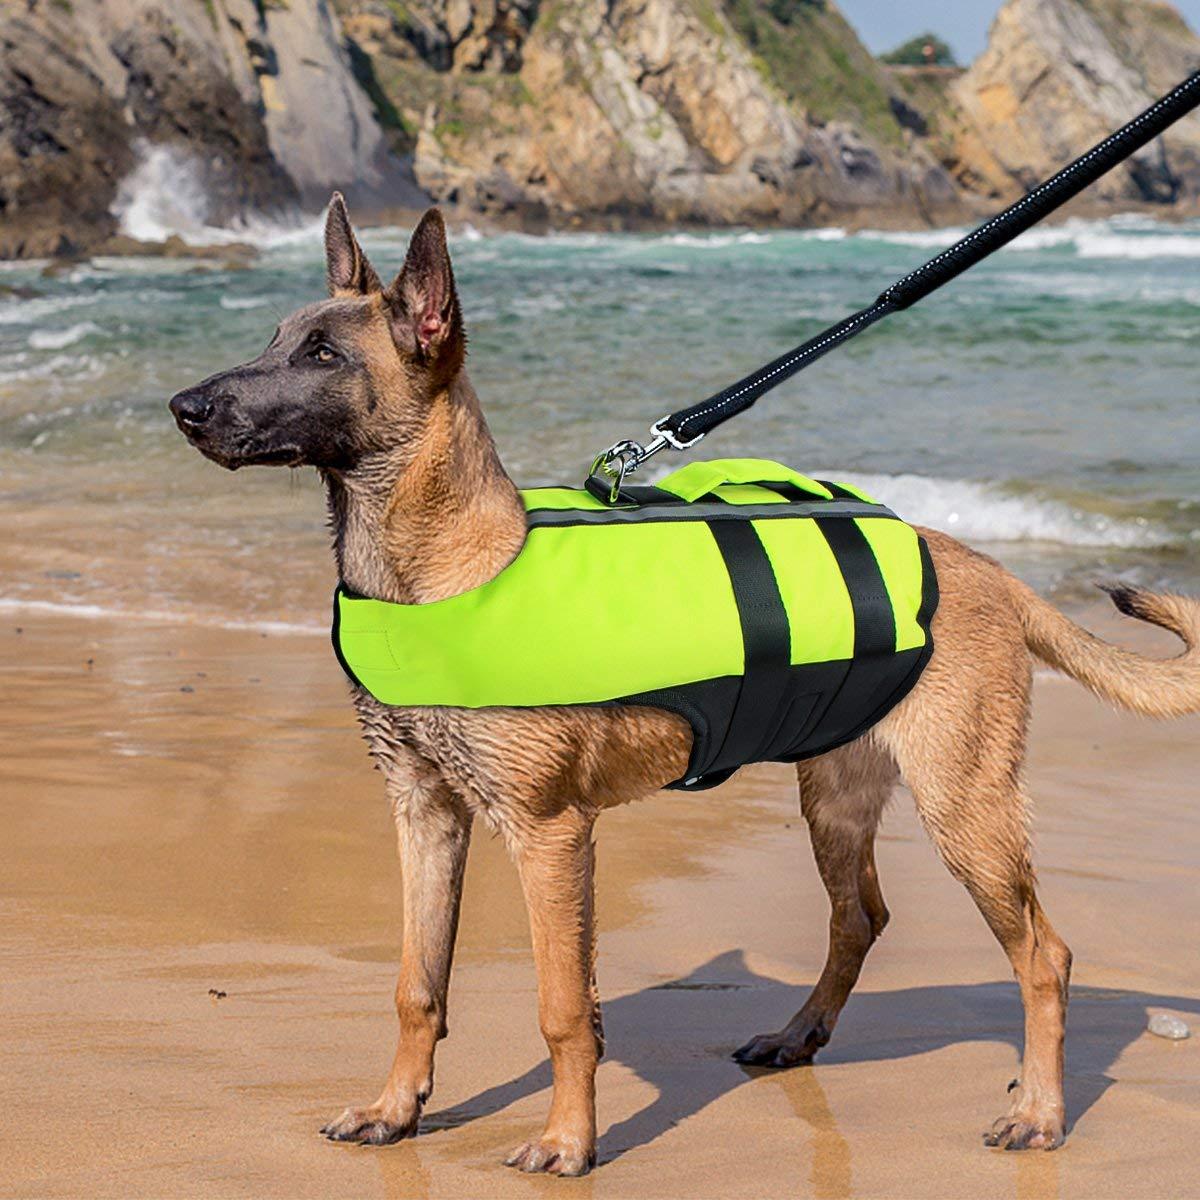 Namsan Dog Life Jacket - Folding Dog Life Vest,Portable Airbag Dog Swimming Jacket Vest,Green,Large by Namsan